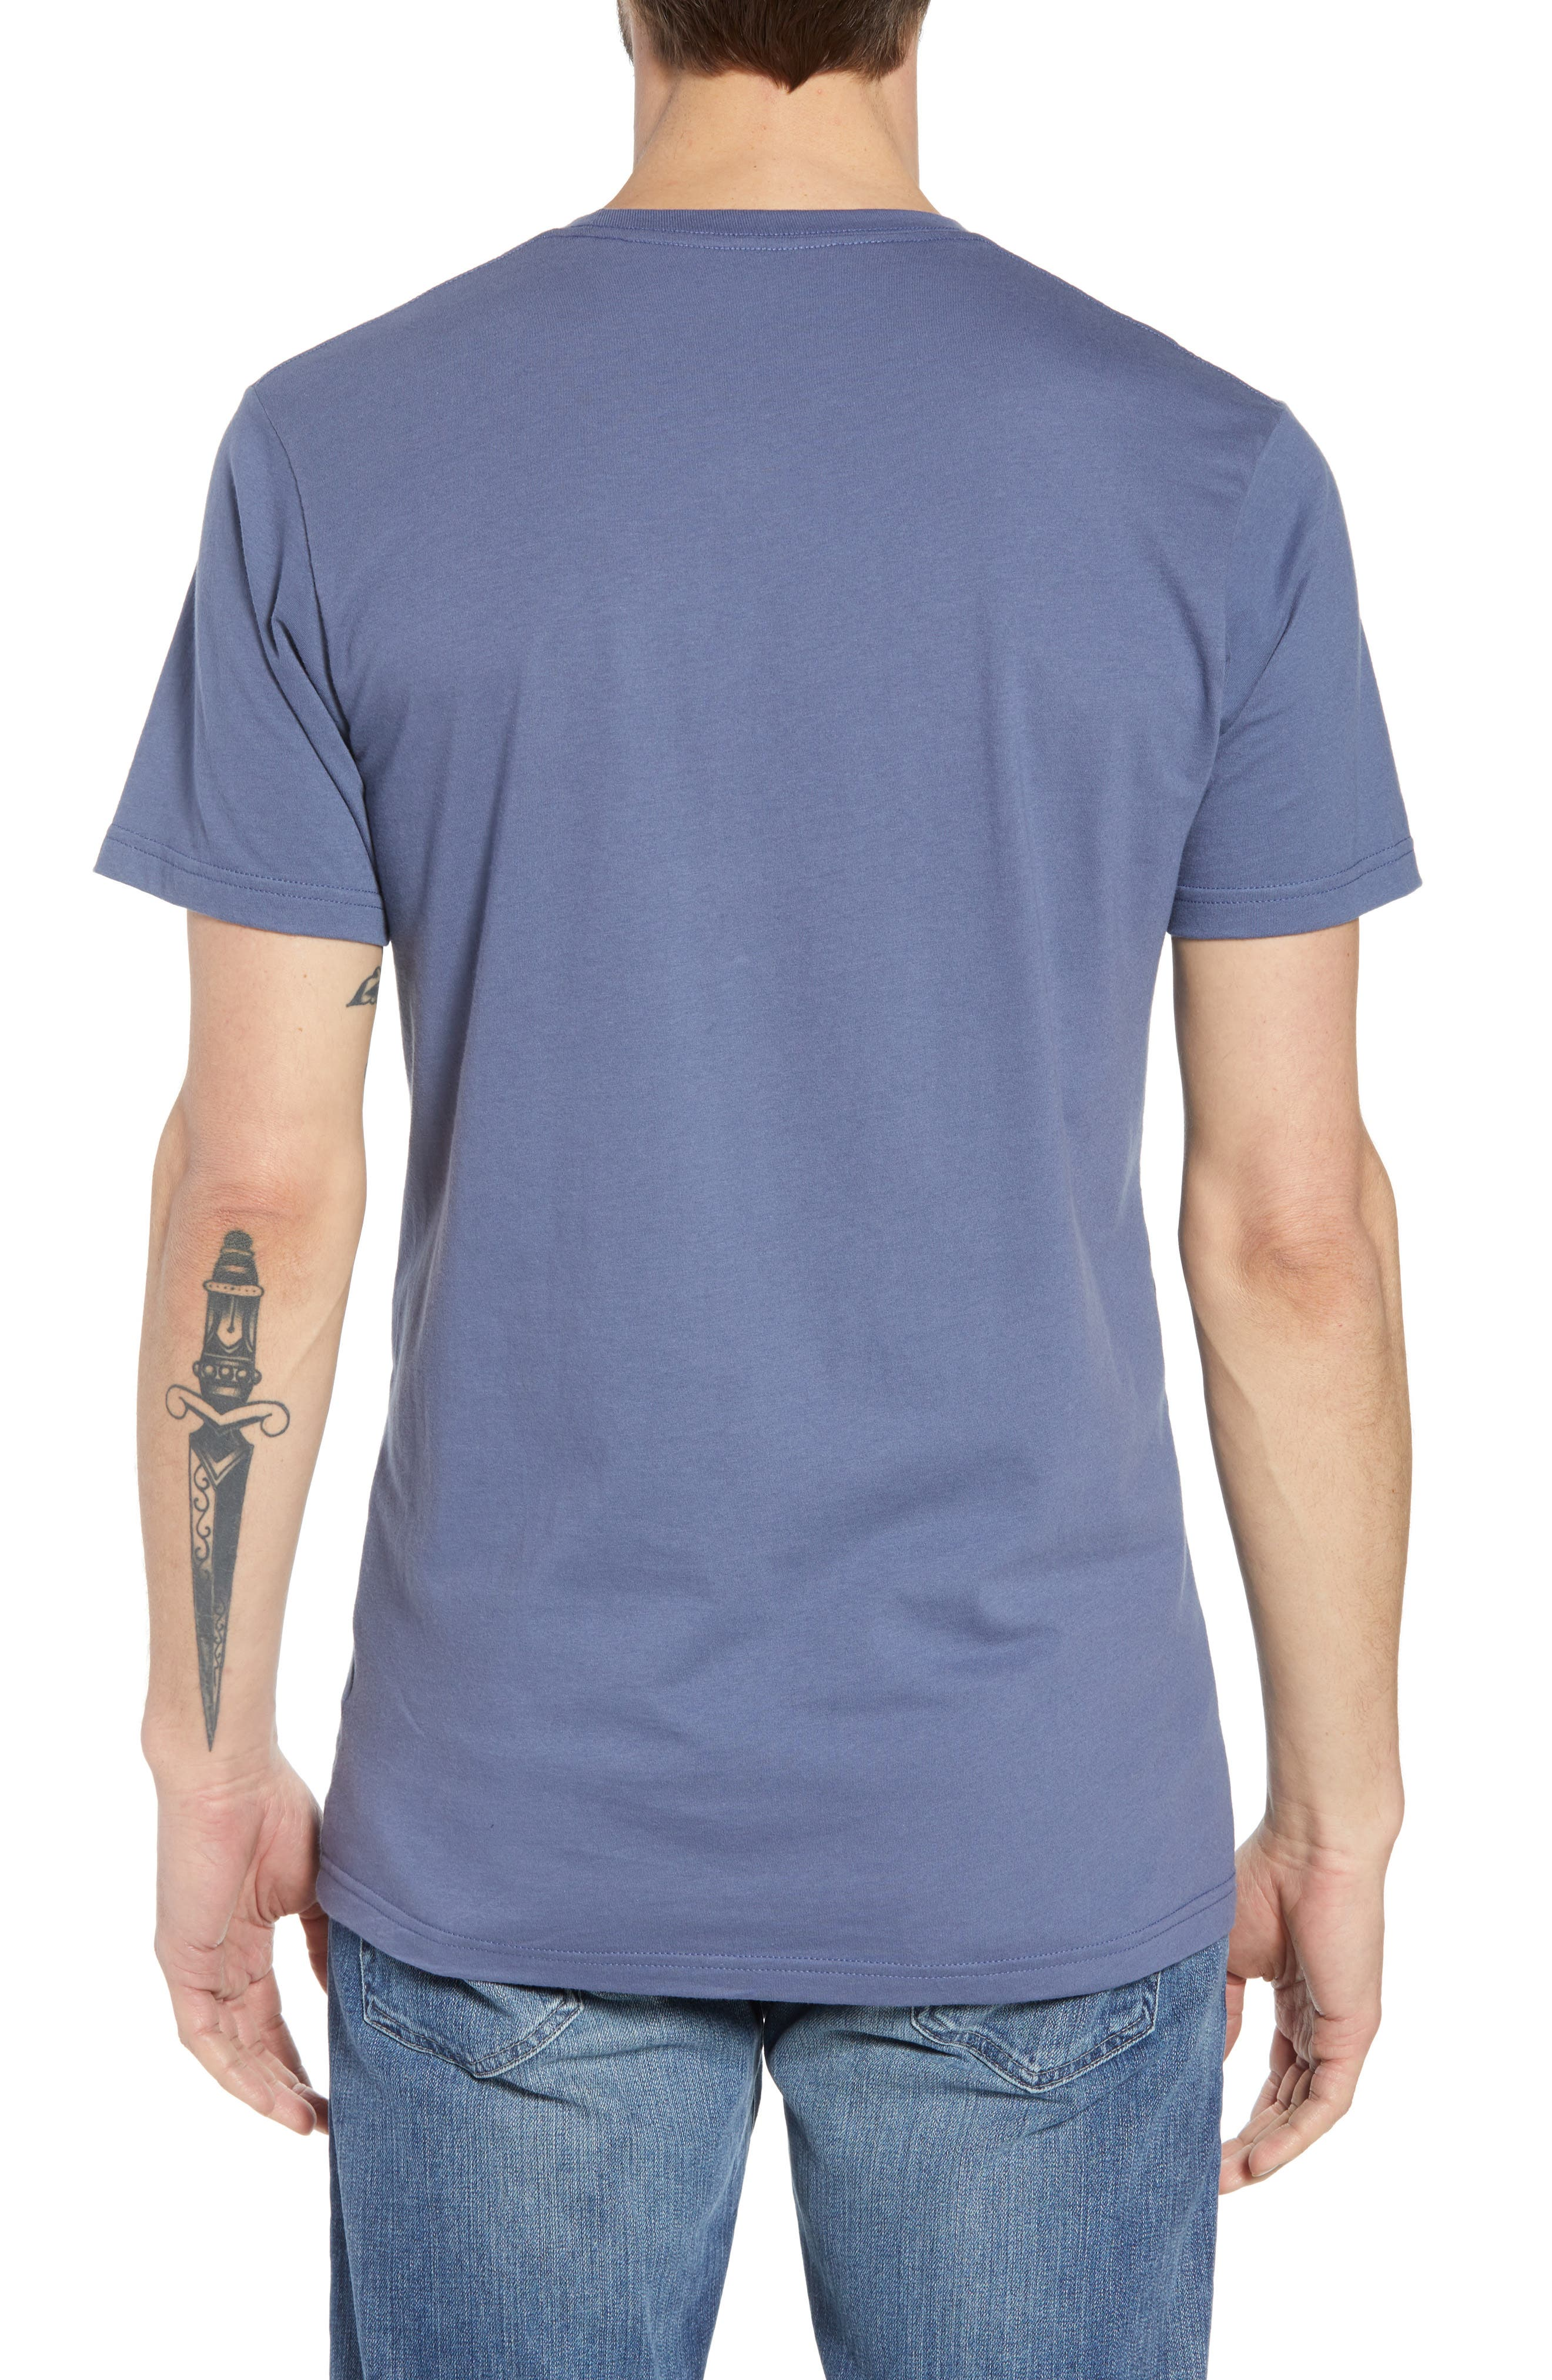 Fitz Roy Scope Crewneck T-Shirt,                             Alternate thumbnail 2, color,                             Dolomite Blue